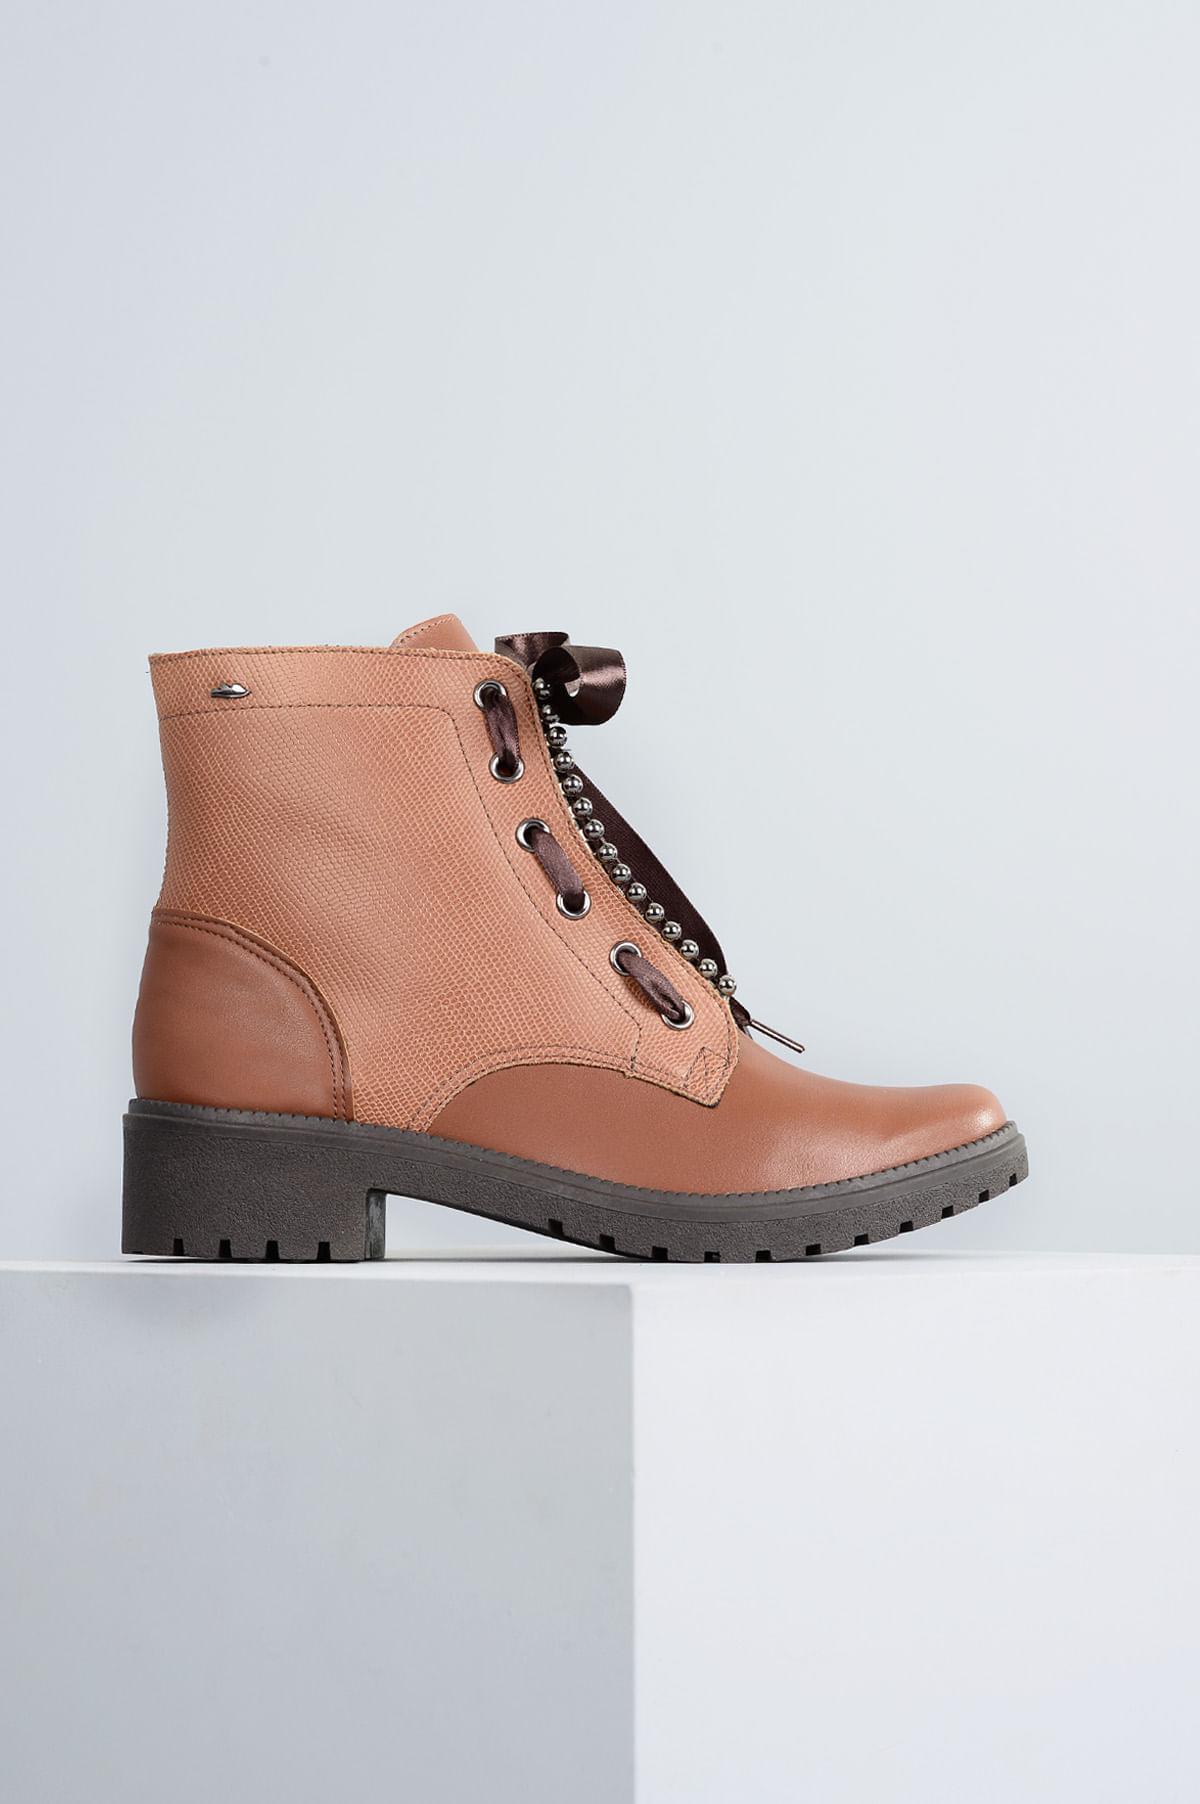 7720024c5e Bota Coturno Telmy Dakota SINT - WHISKY - Mundial Calçados